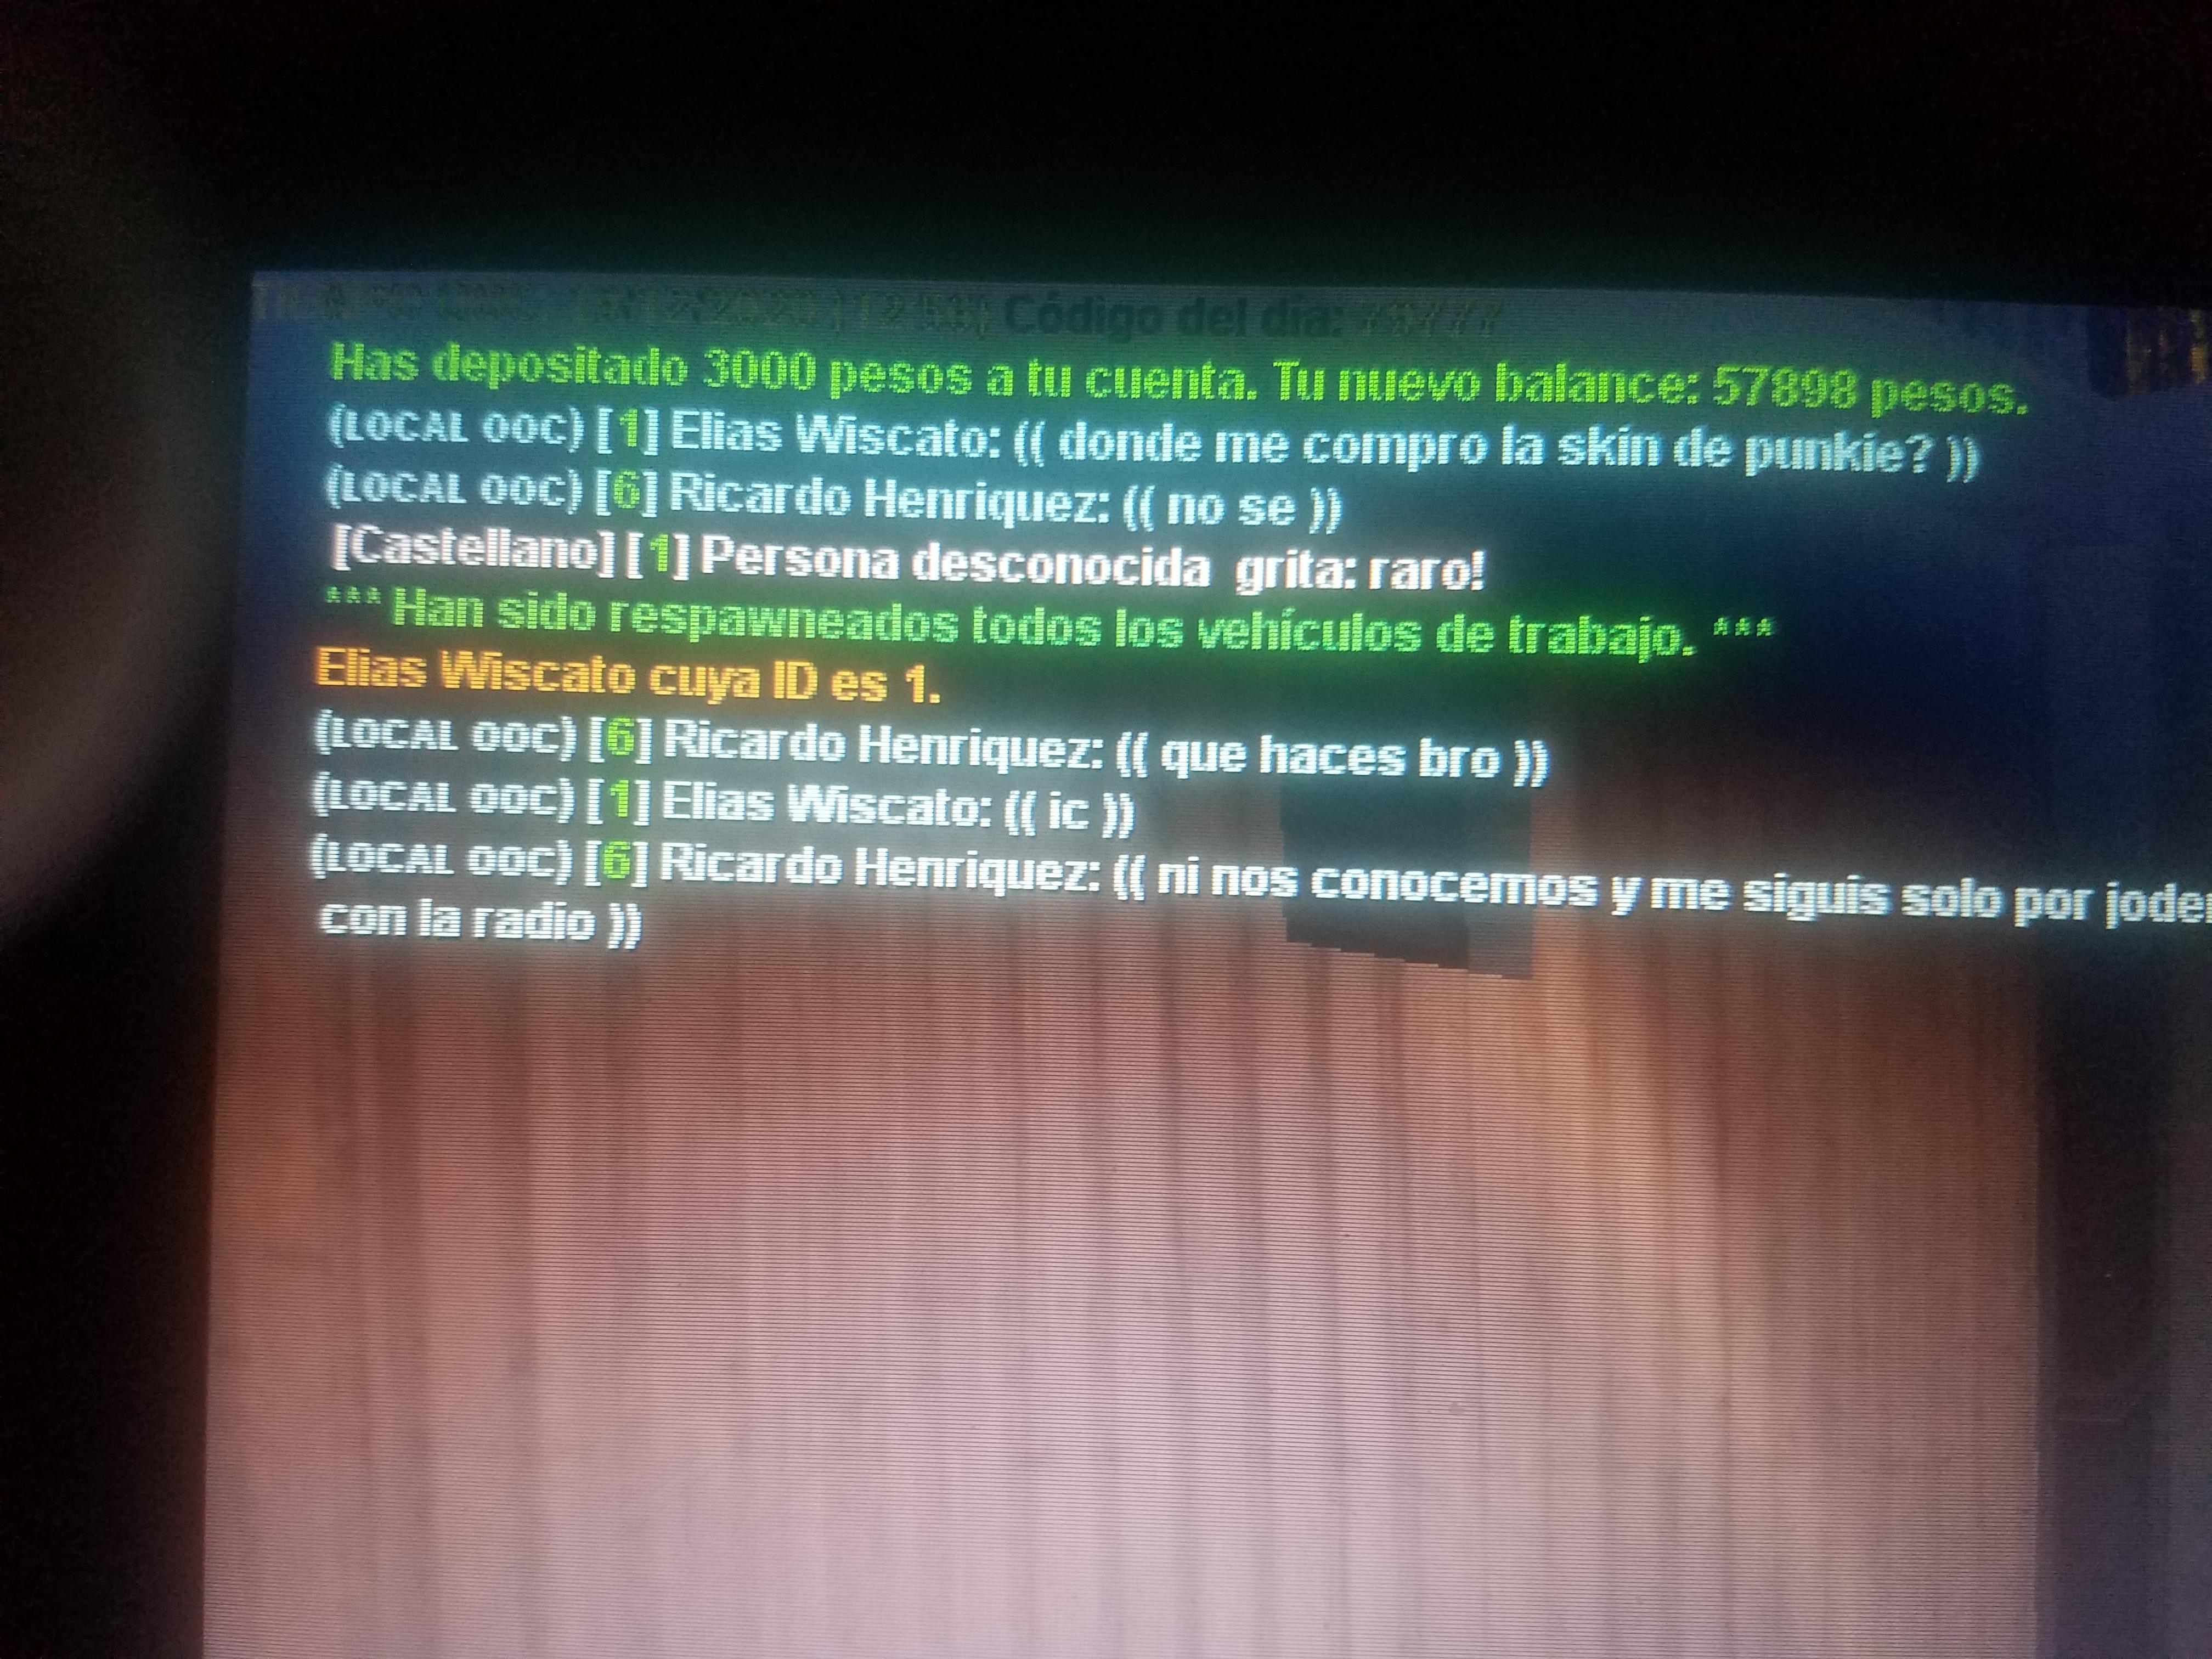 [Reporte] Elias_Wiscato  20201219_065607